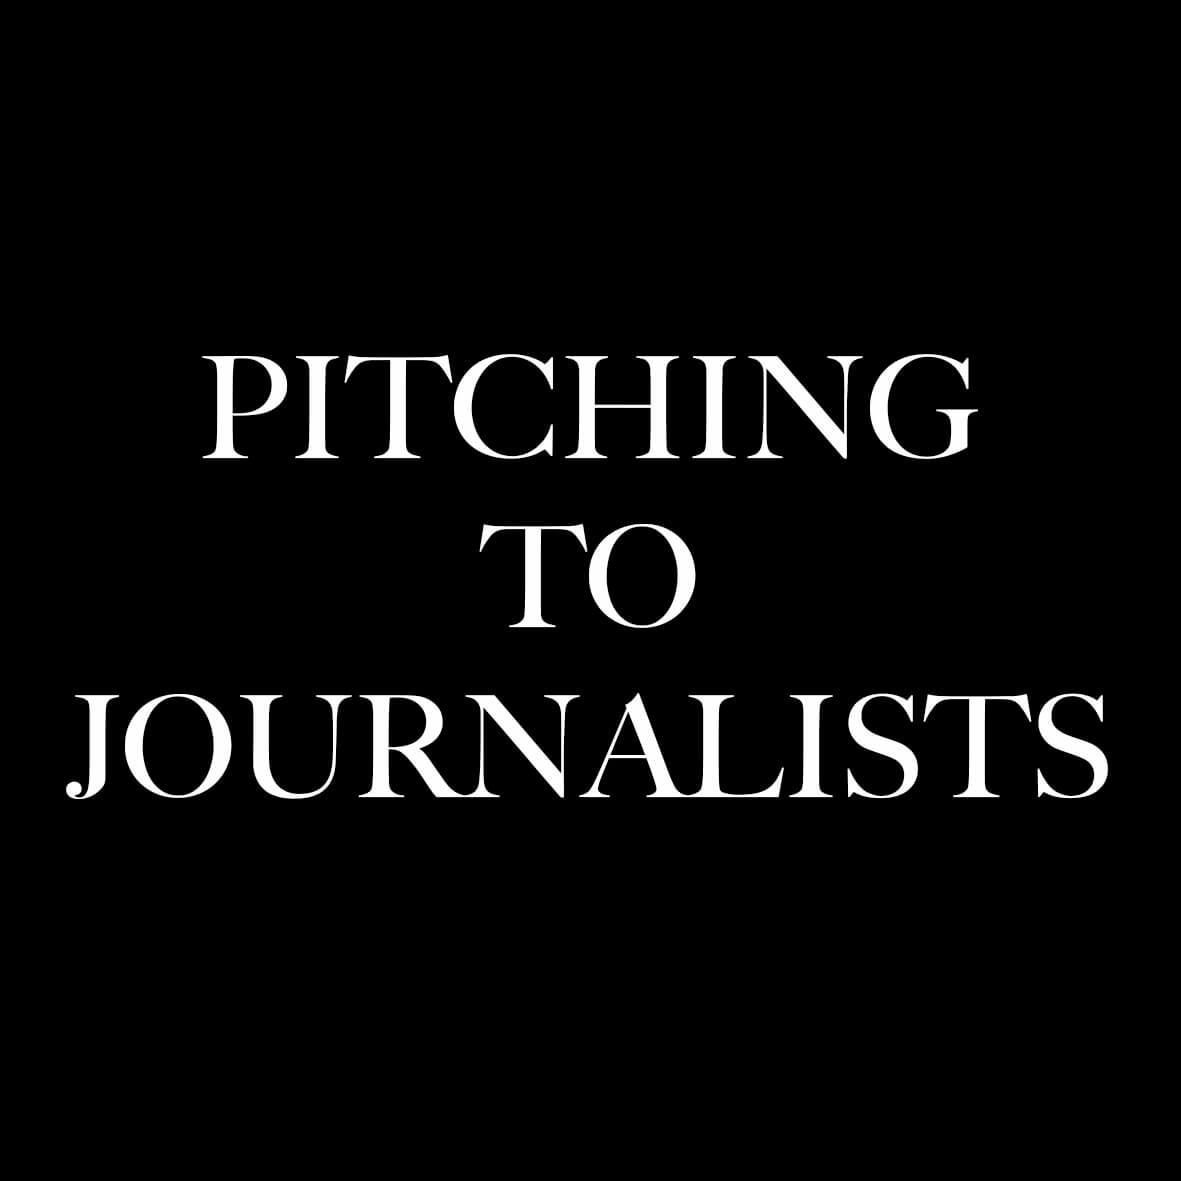 PR tips, PR templates, Free PR templates, press release writing guide, free press release template